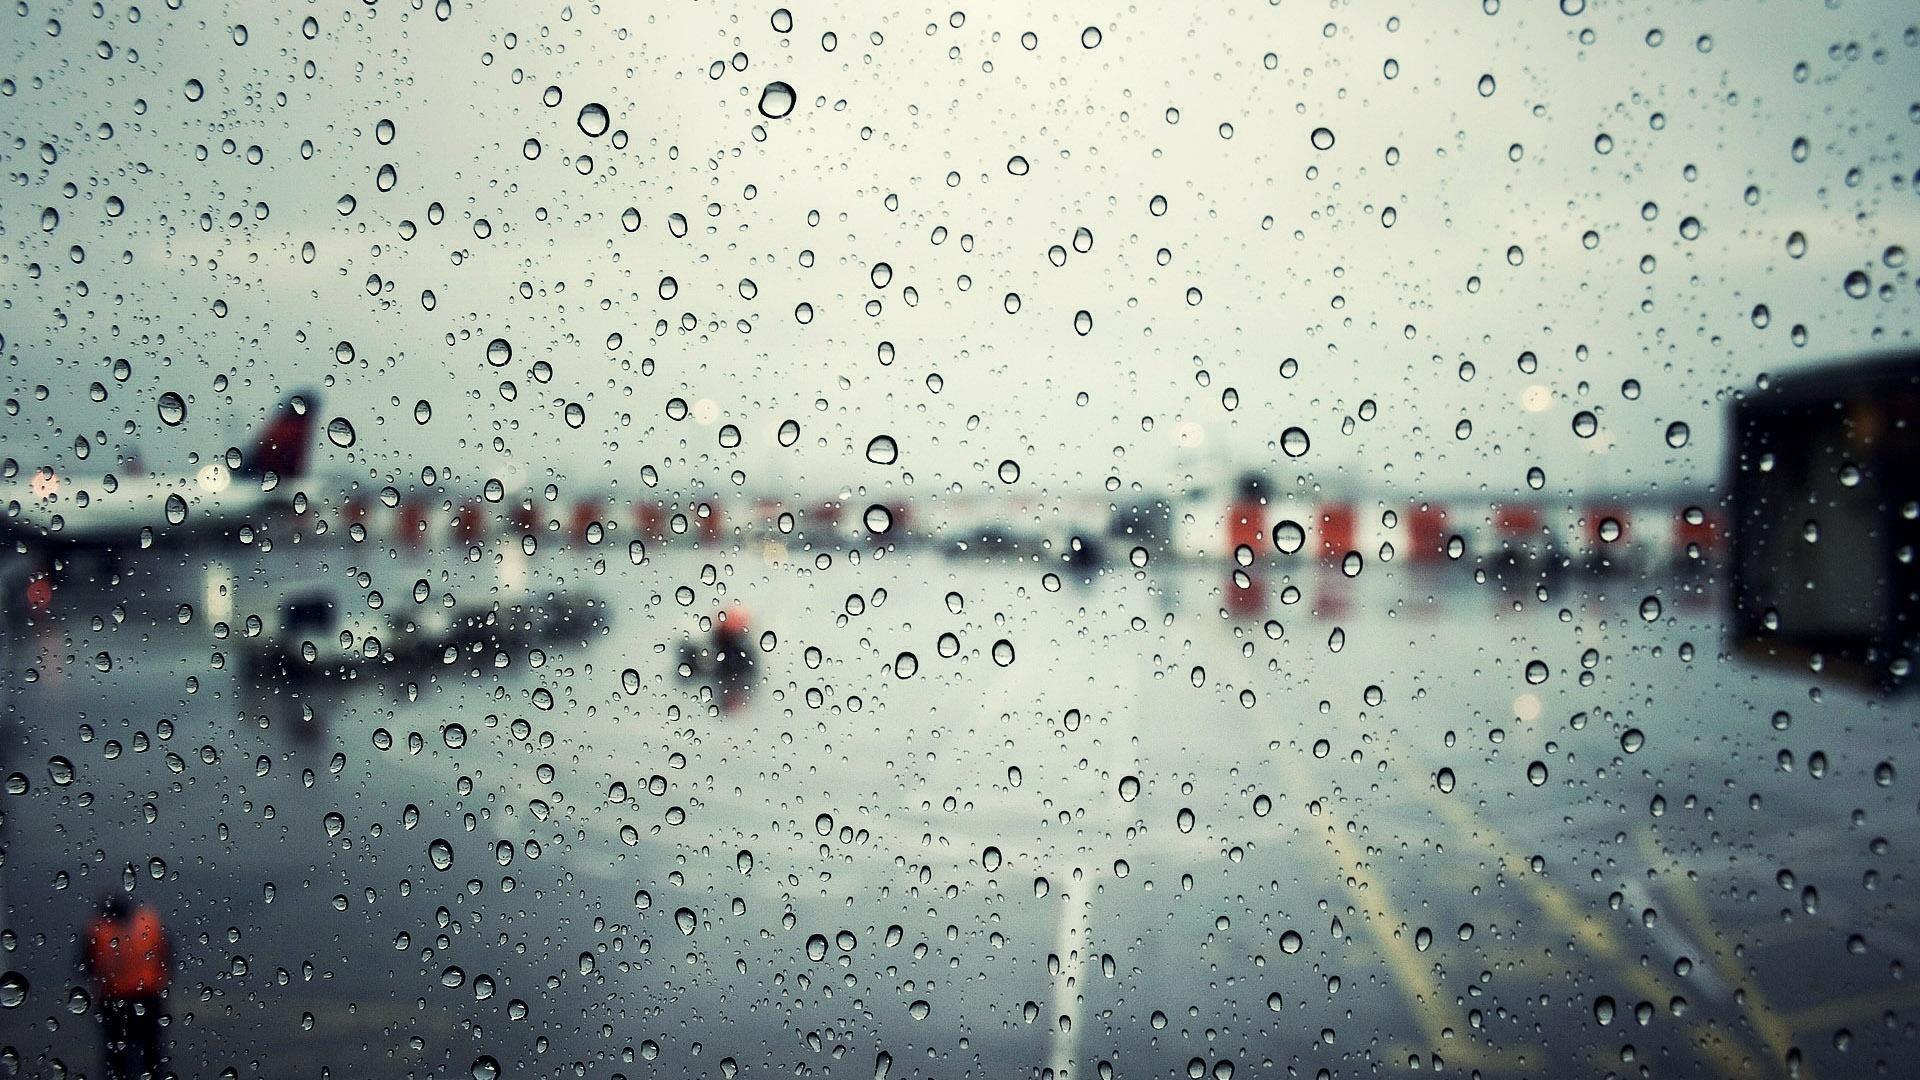 HD Rain Wallpapers (72+ images)